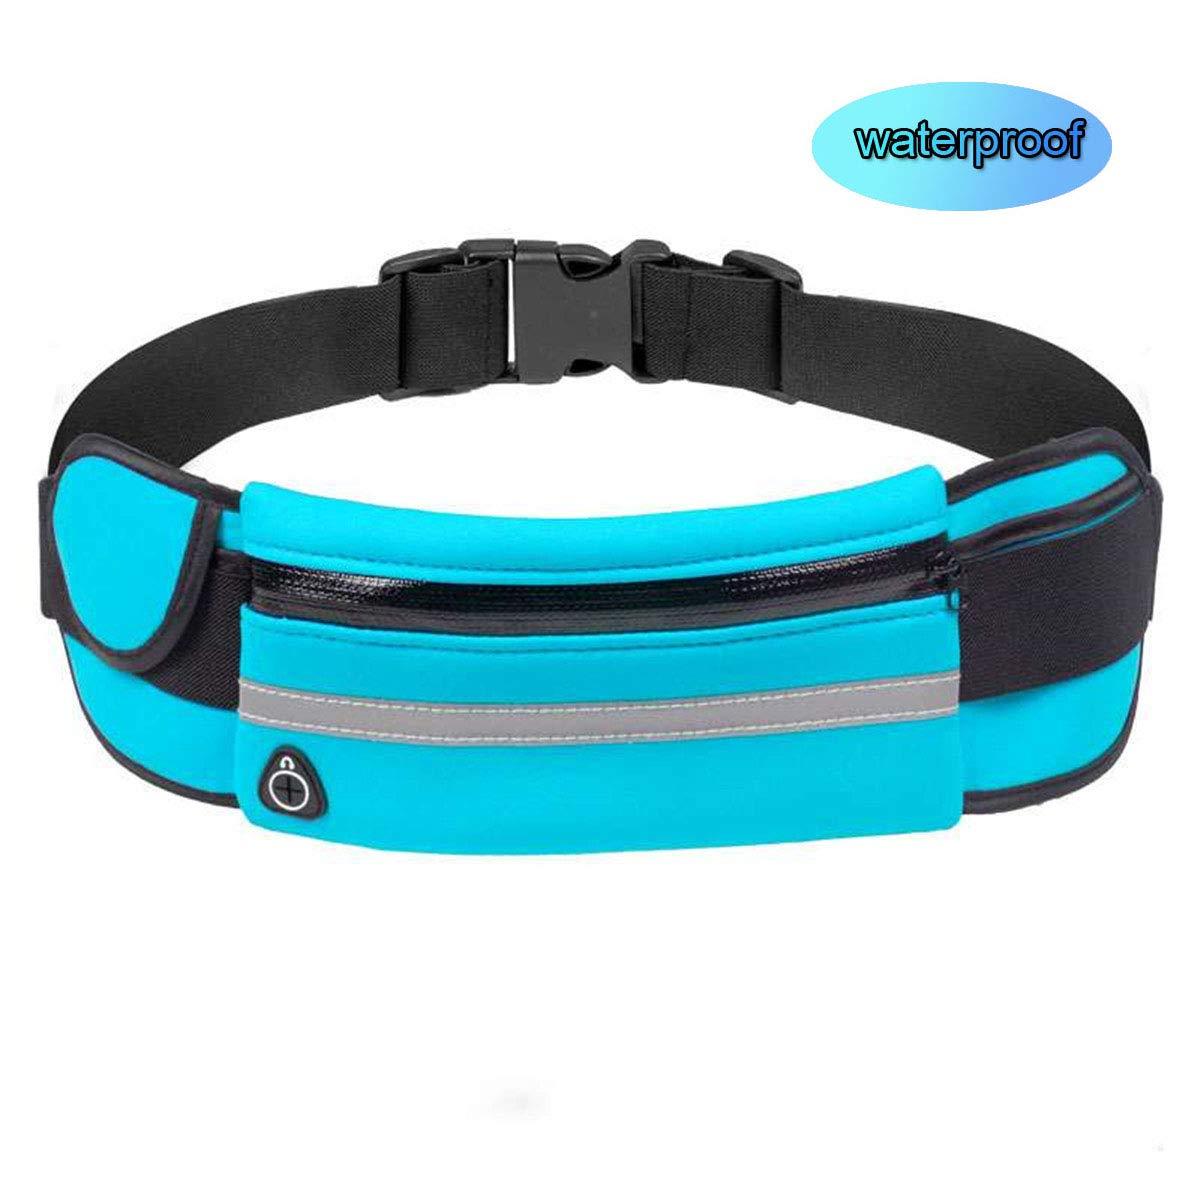 Night Running Safe Reflection Waist Bag Pocket for Men/Women Outdoor Sports Purse Belt Bag (fs-Black)